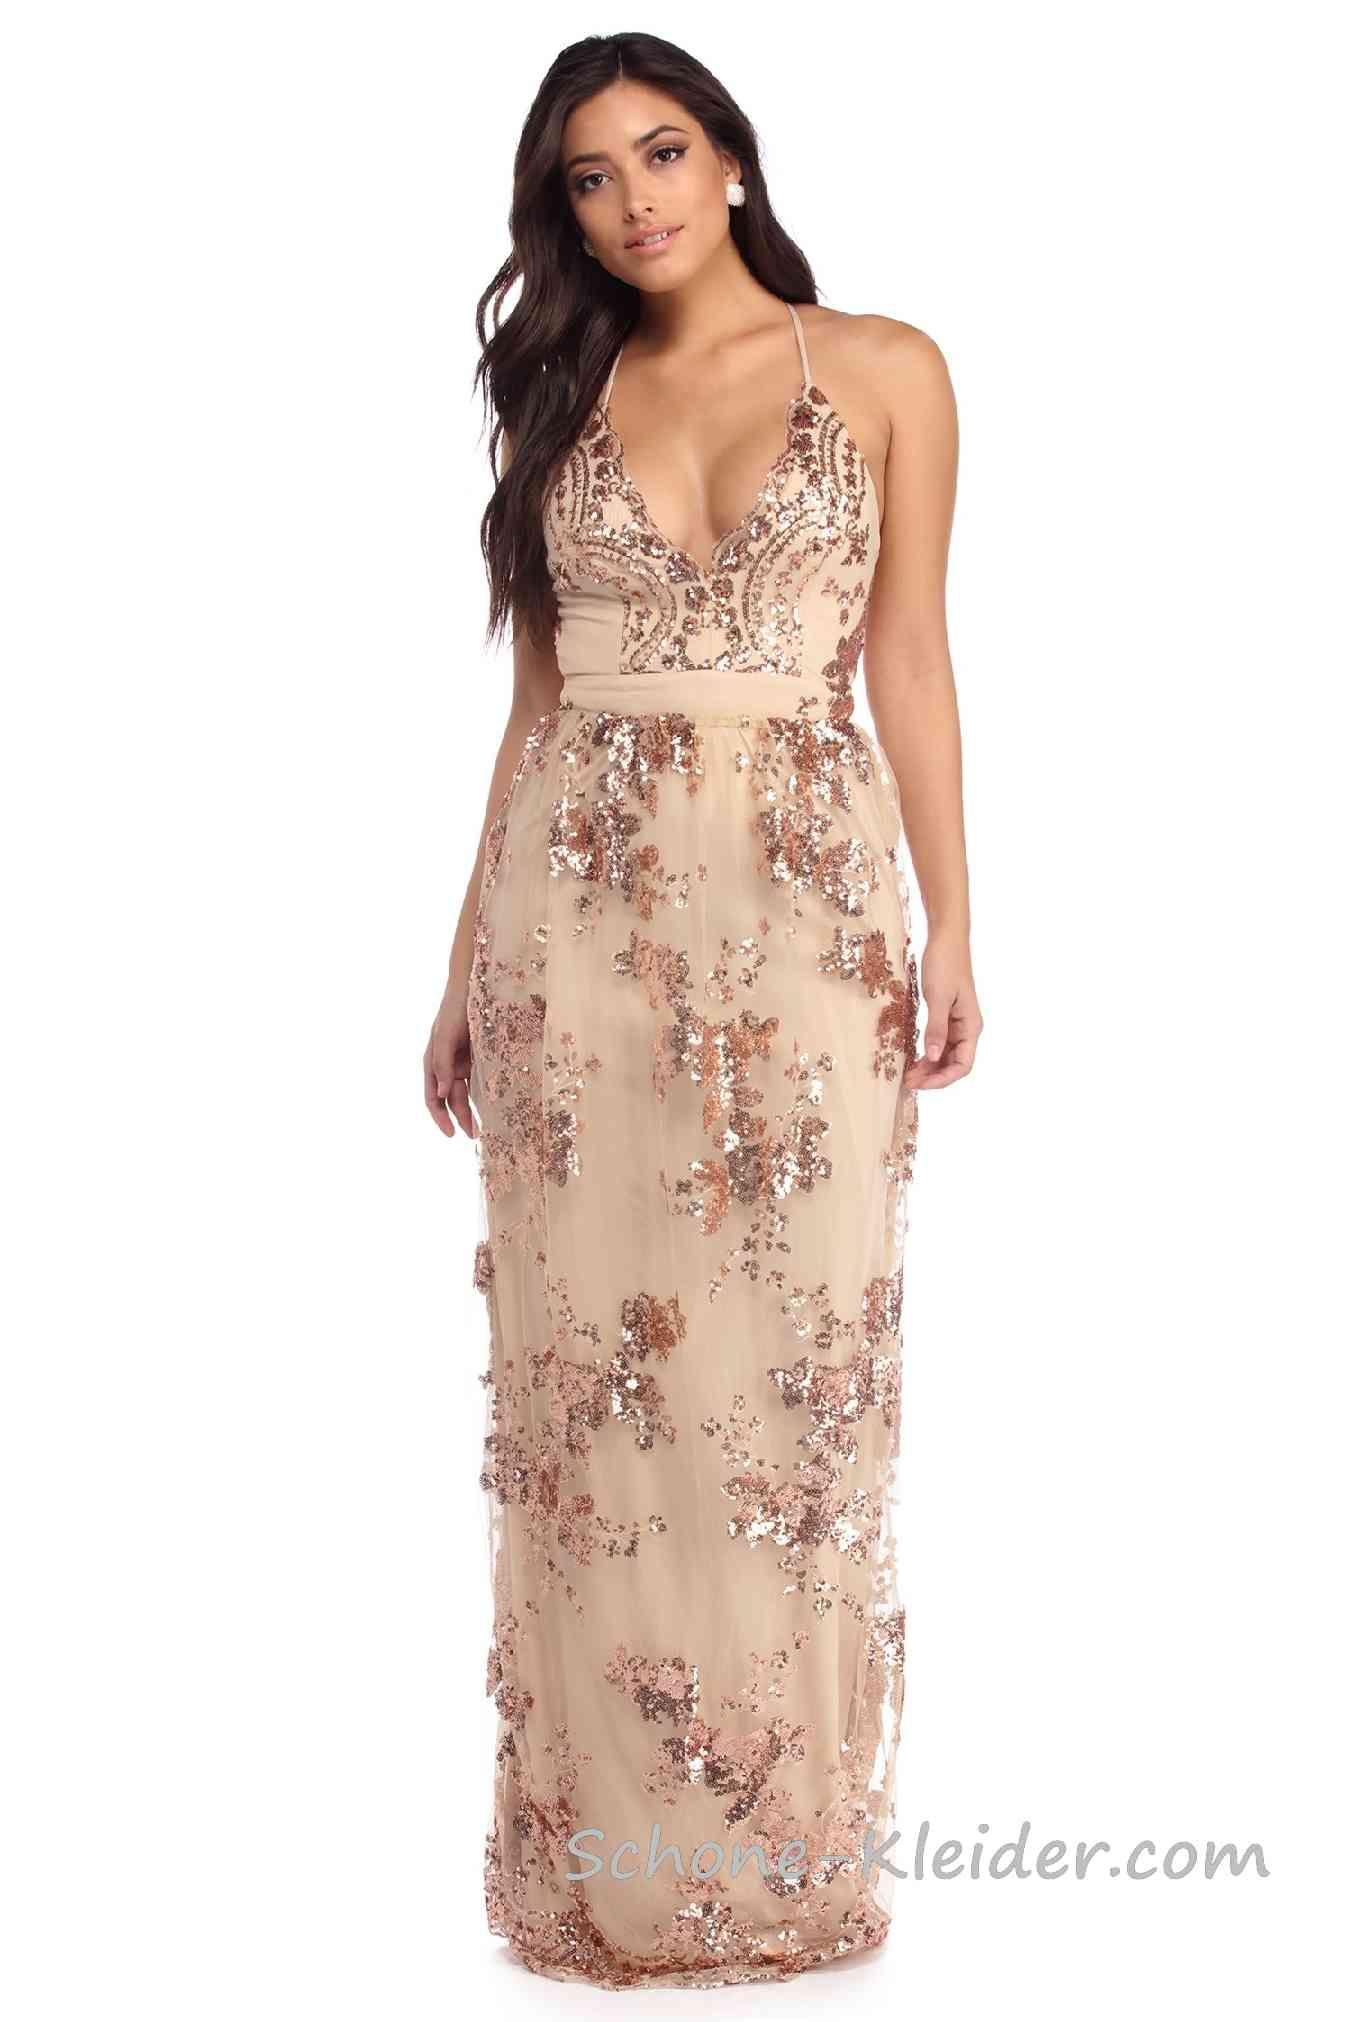 Ärmelloses Paillettenkleid Lang  Pailletten kleid